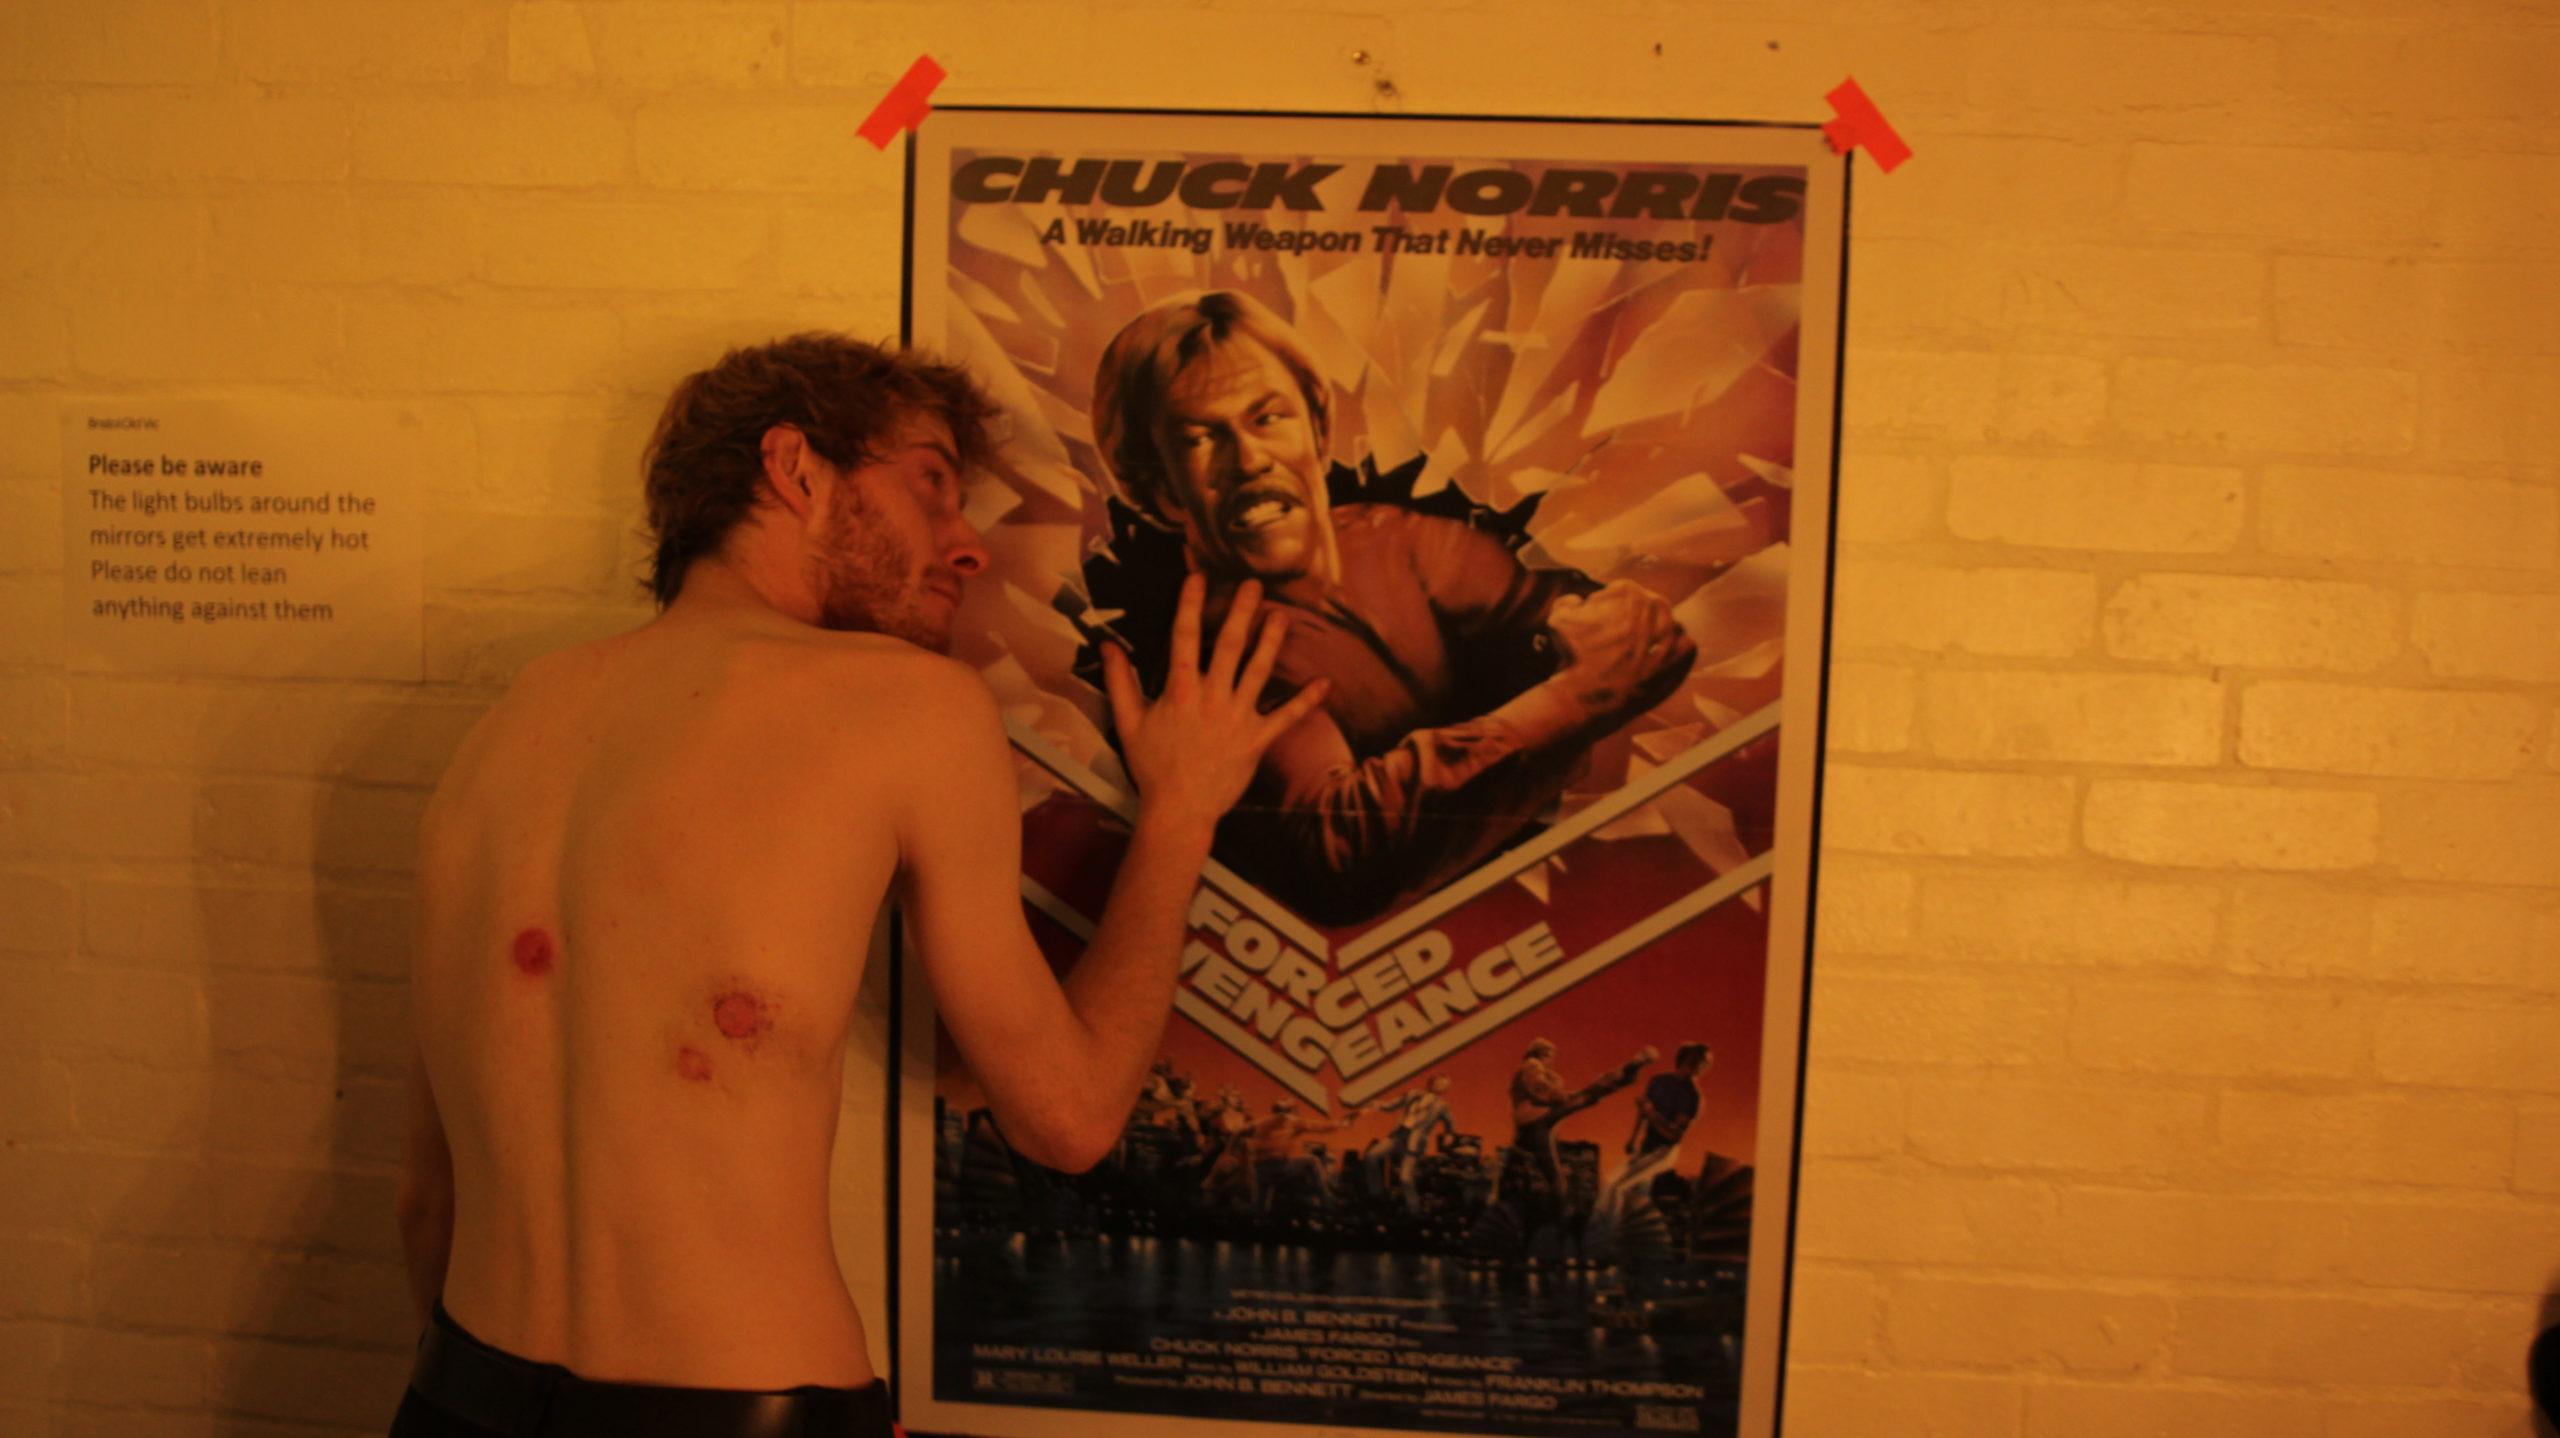 Pre Show Chuck Norris ritual